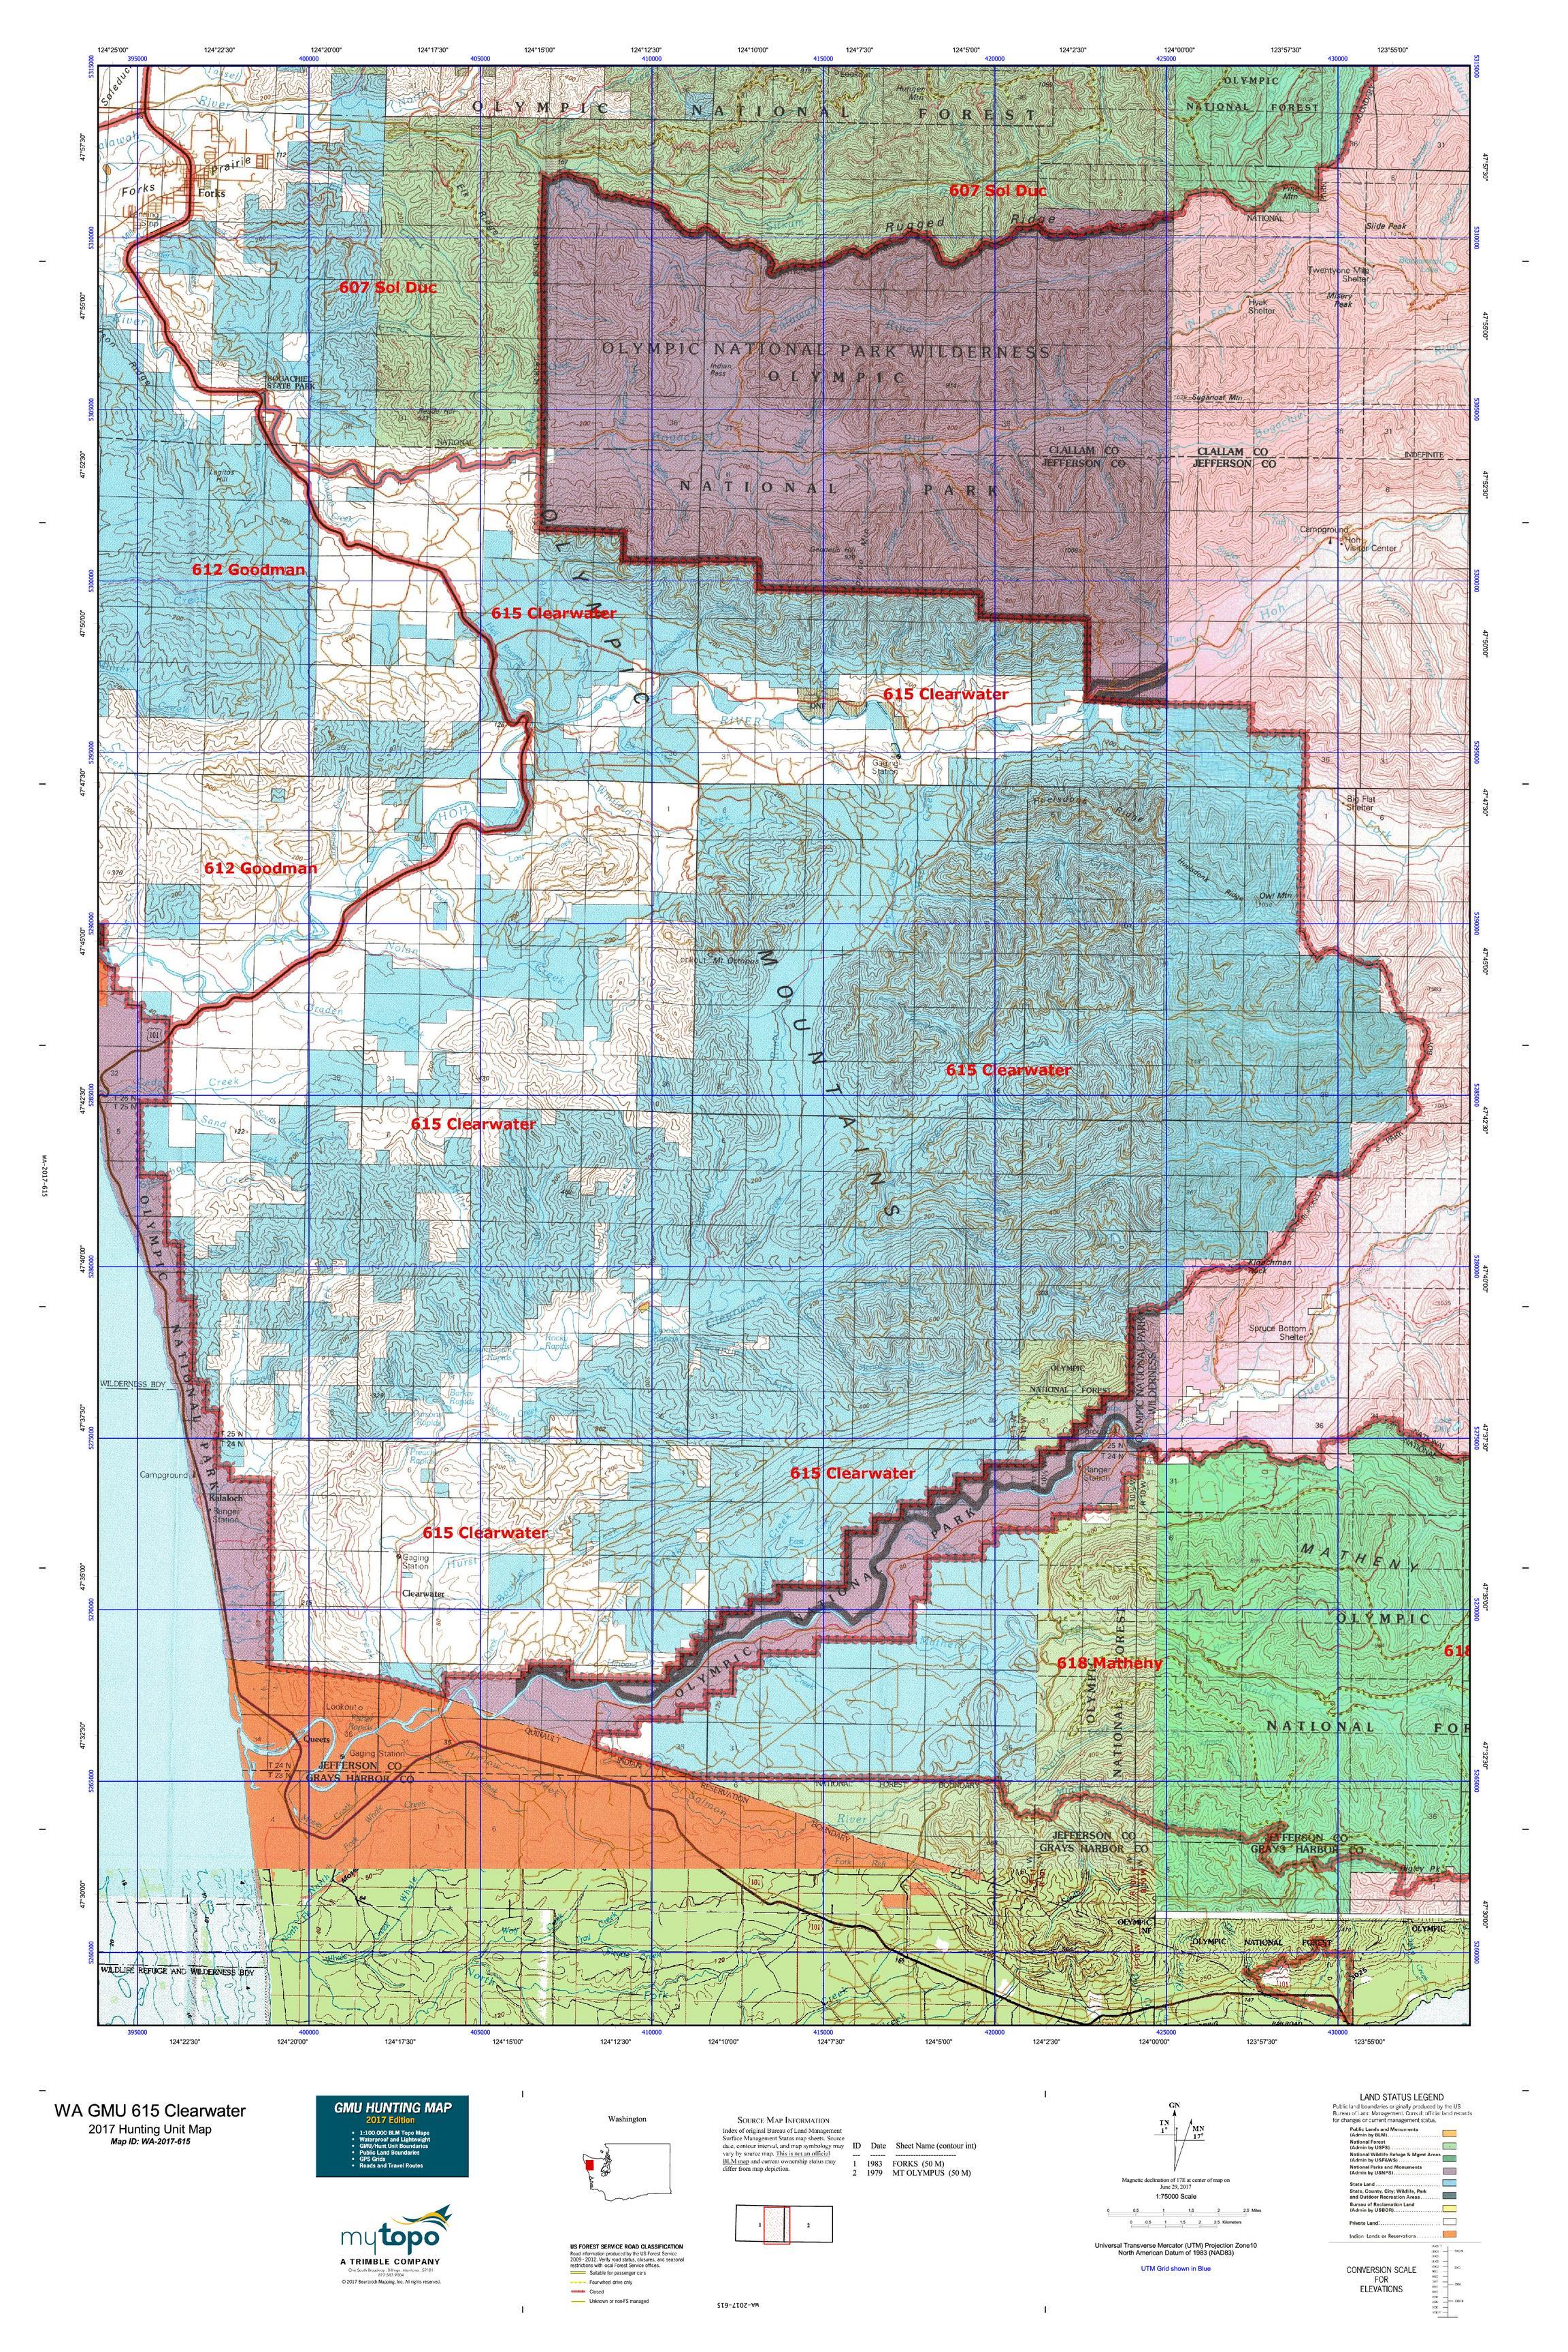 WA GMU 615 Clearwater Map MyTopo